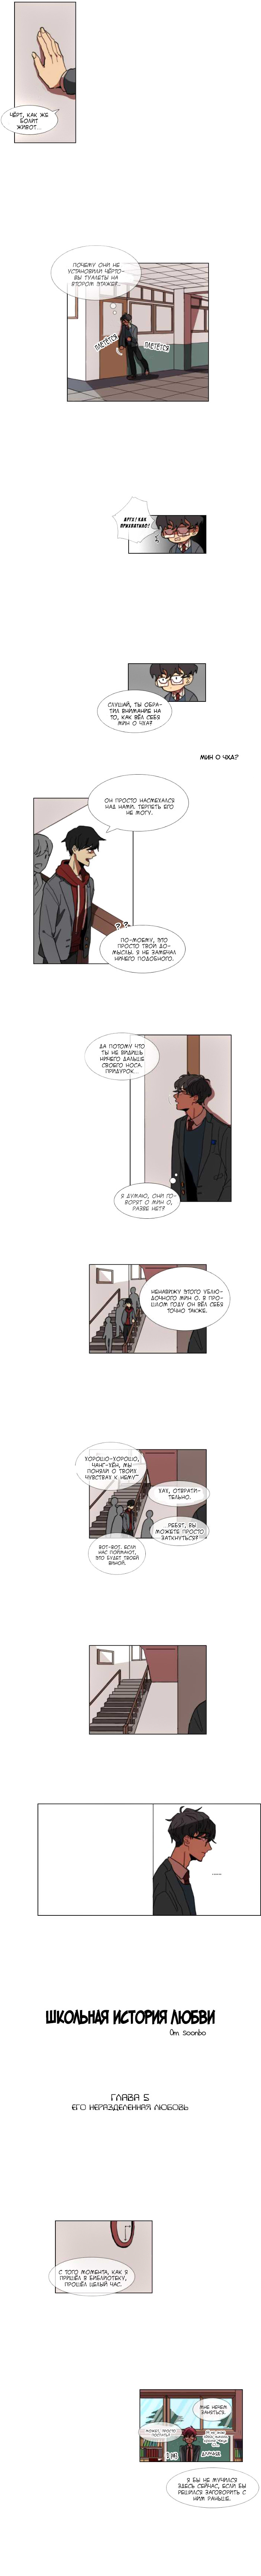 https://r1.ninemanga.com/comics/pic2/27/31131/409987/1519639504613.jpg Page 1